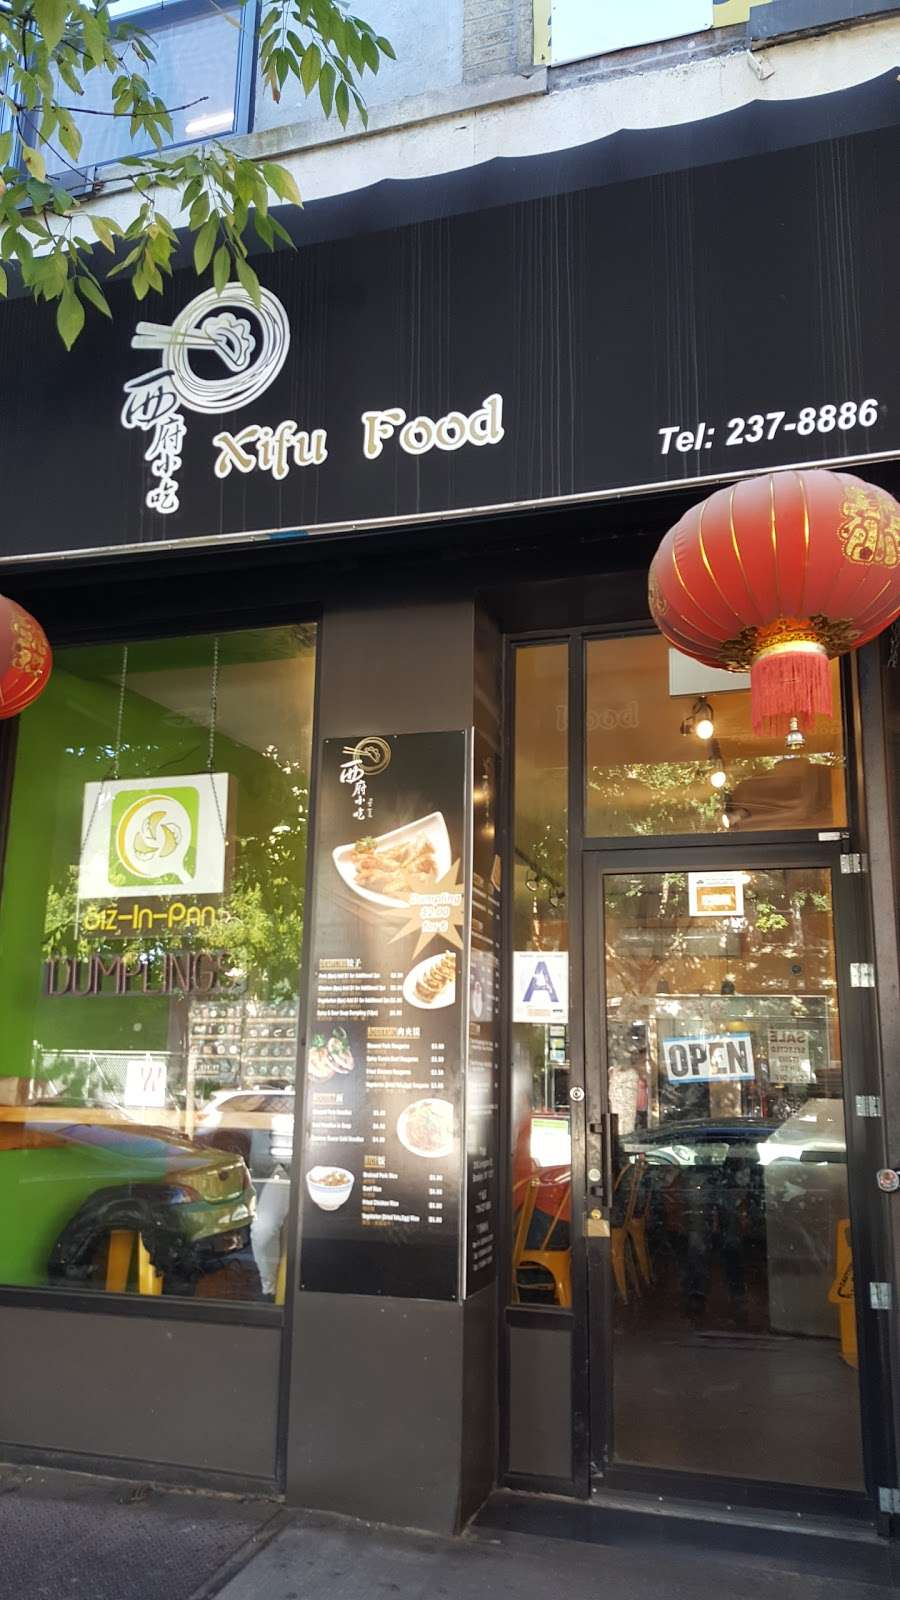 Xifu Food - restaurant  | Photo 2 of 10 | Address: 318 Livingston St, Brooklyn, NY 11217, USA | Phone: (718) 237-8886